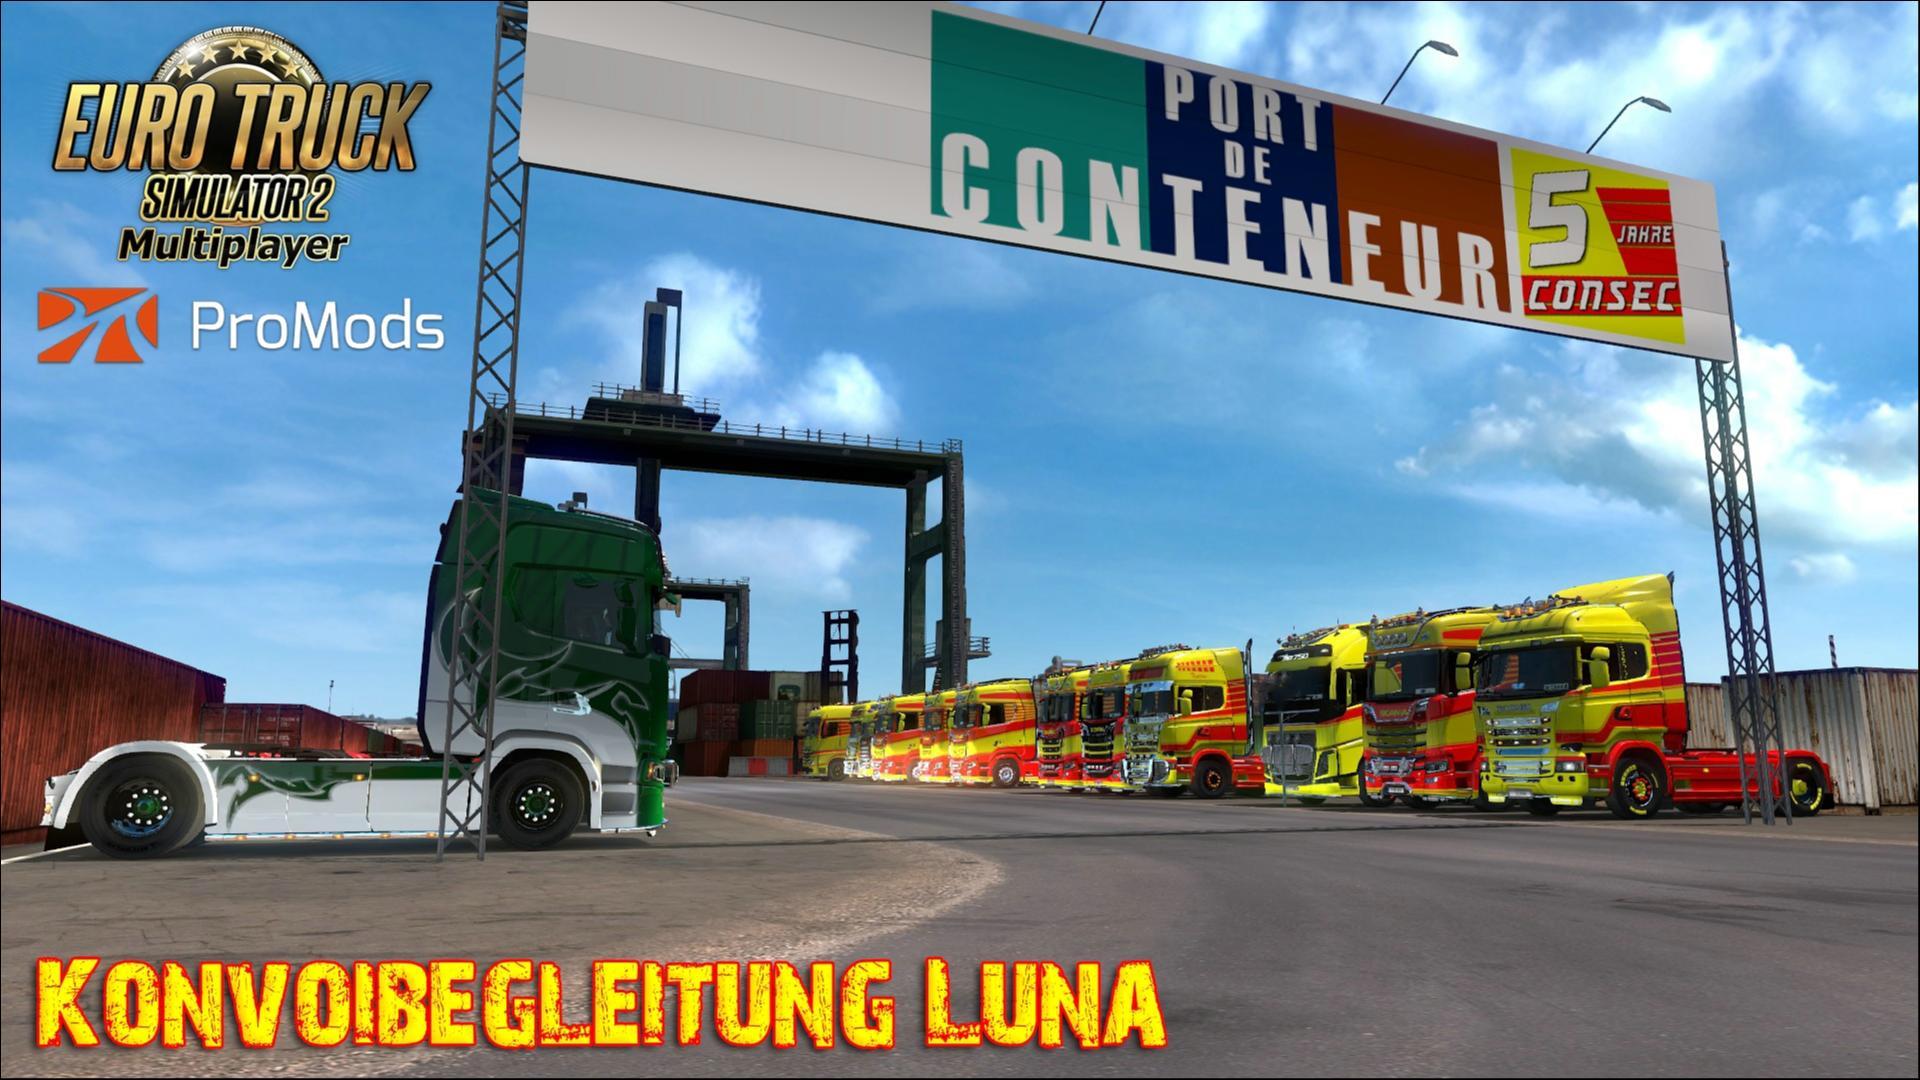 ConSec Konvoibegleitung Luna, ETS2 ProMods